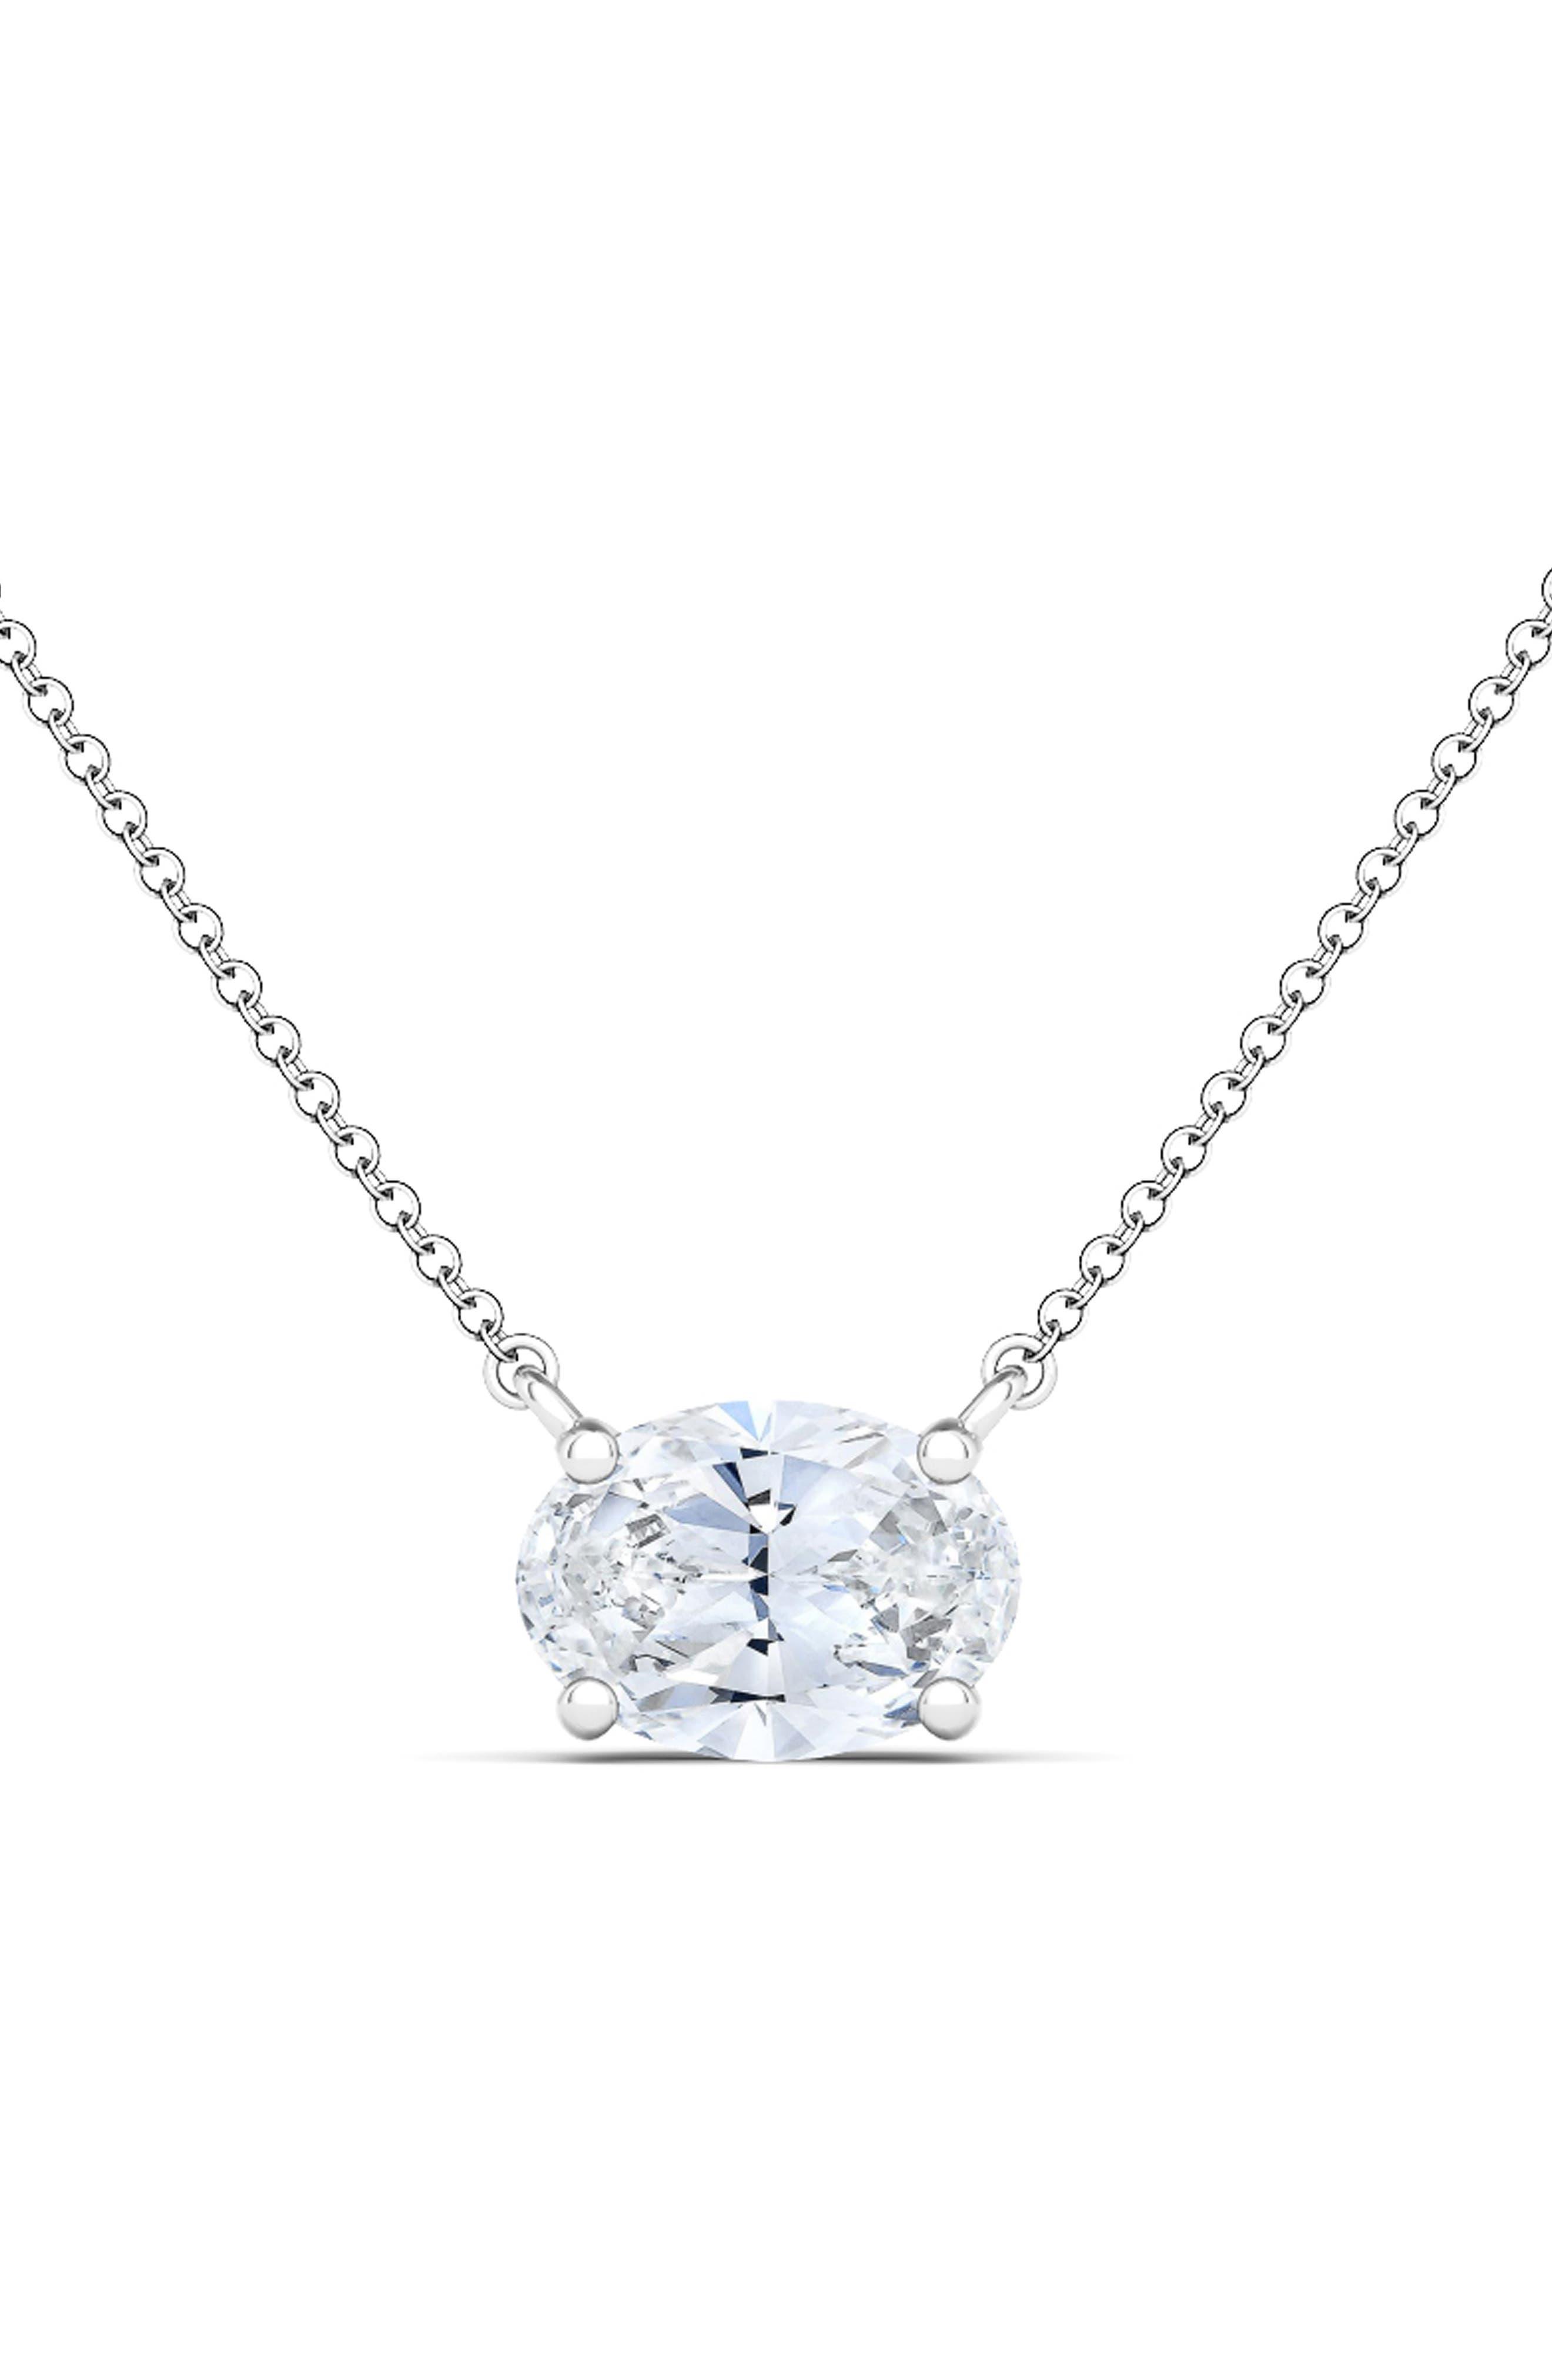 Oval Lab Grown Diamond Pendant Necklace